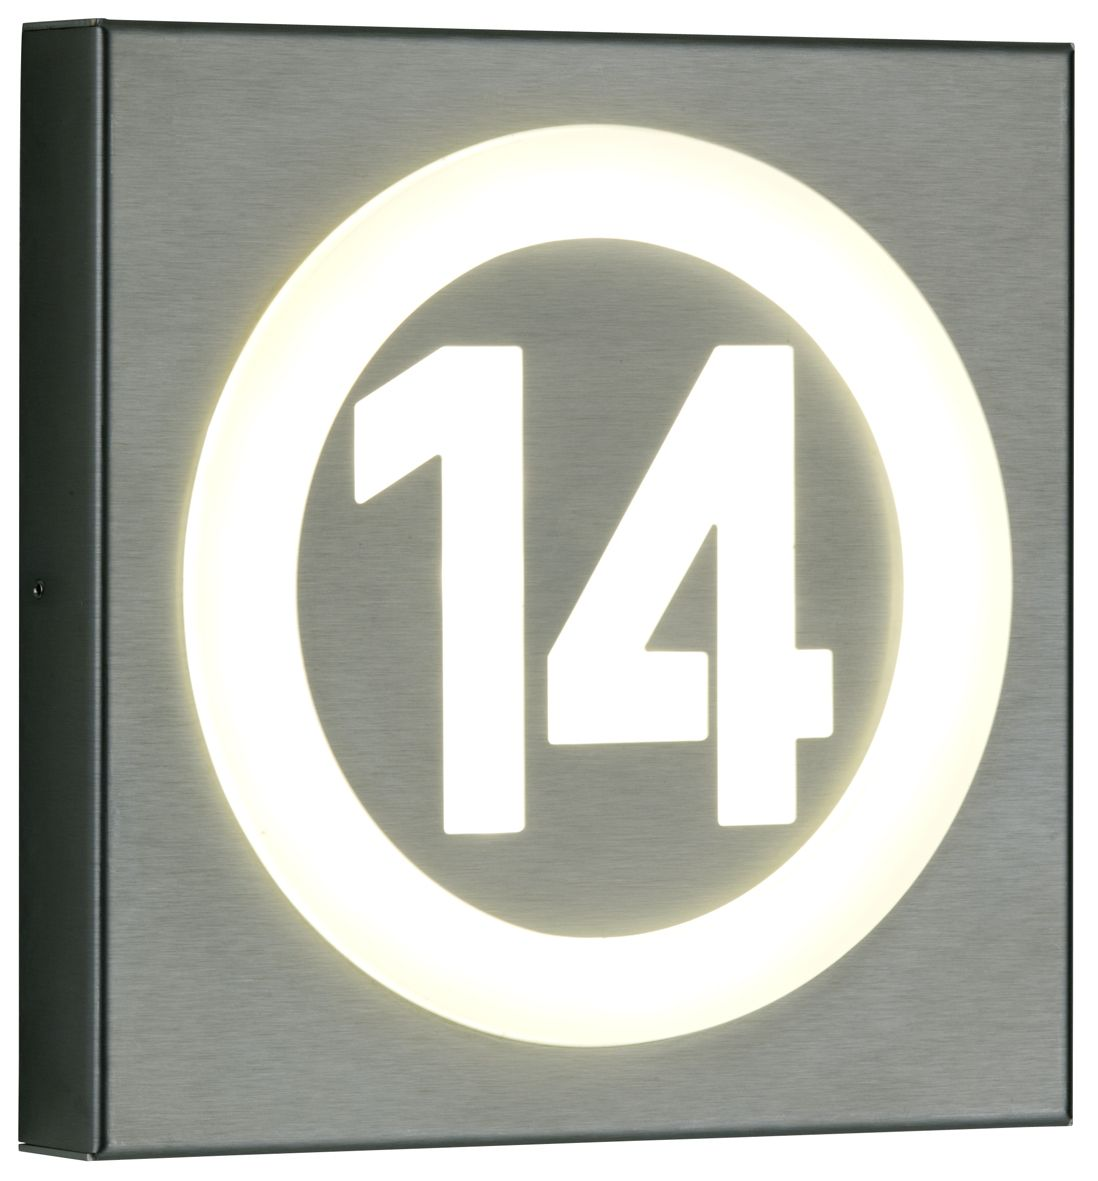 696016 Albert Led Hausnummernleuchte House Number Light Lamp With House Number Entrance Edelstahl Stainless Steel In Albert Leuchten Leuchten Hausnummern